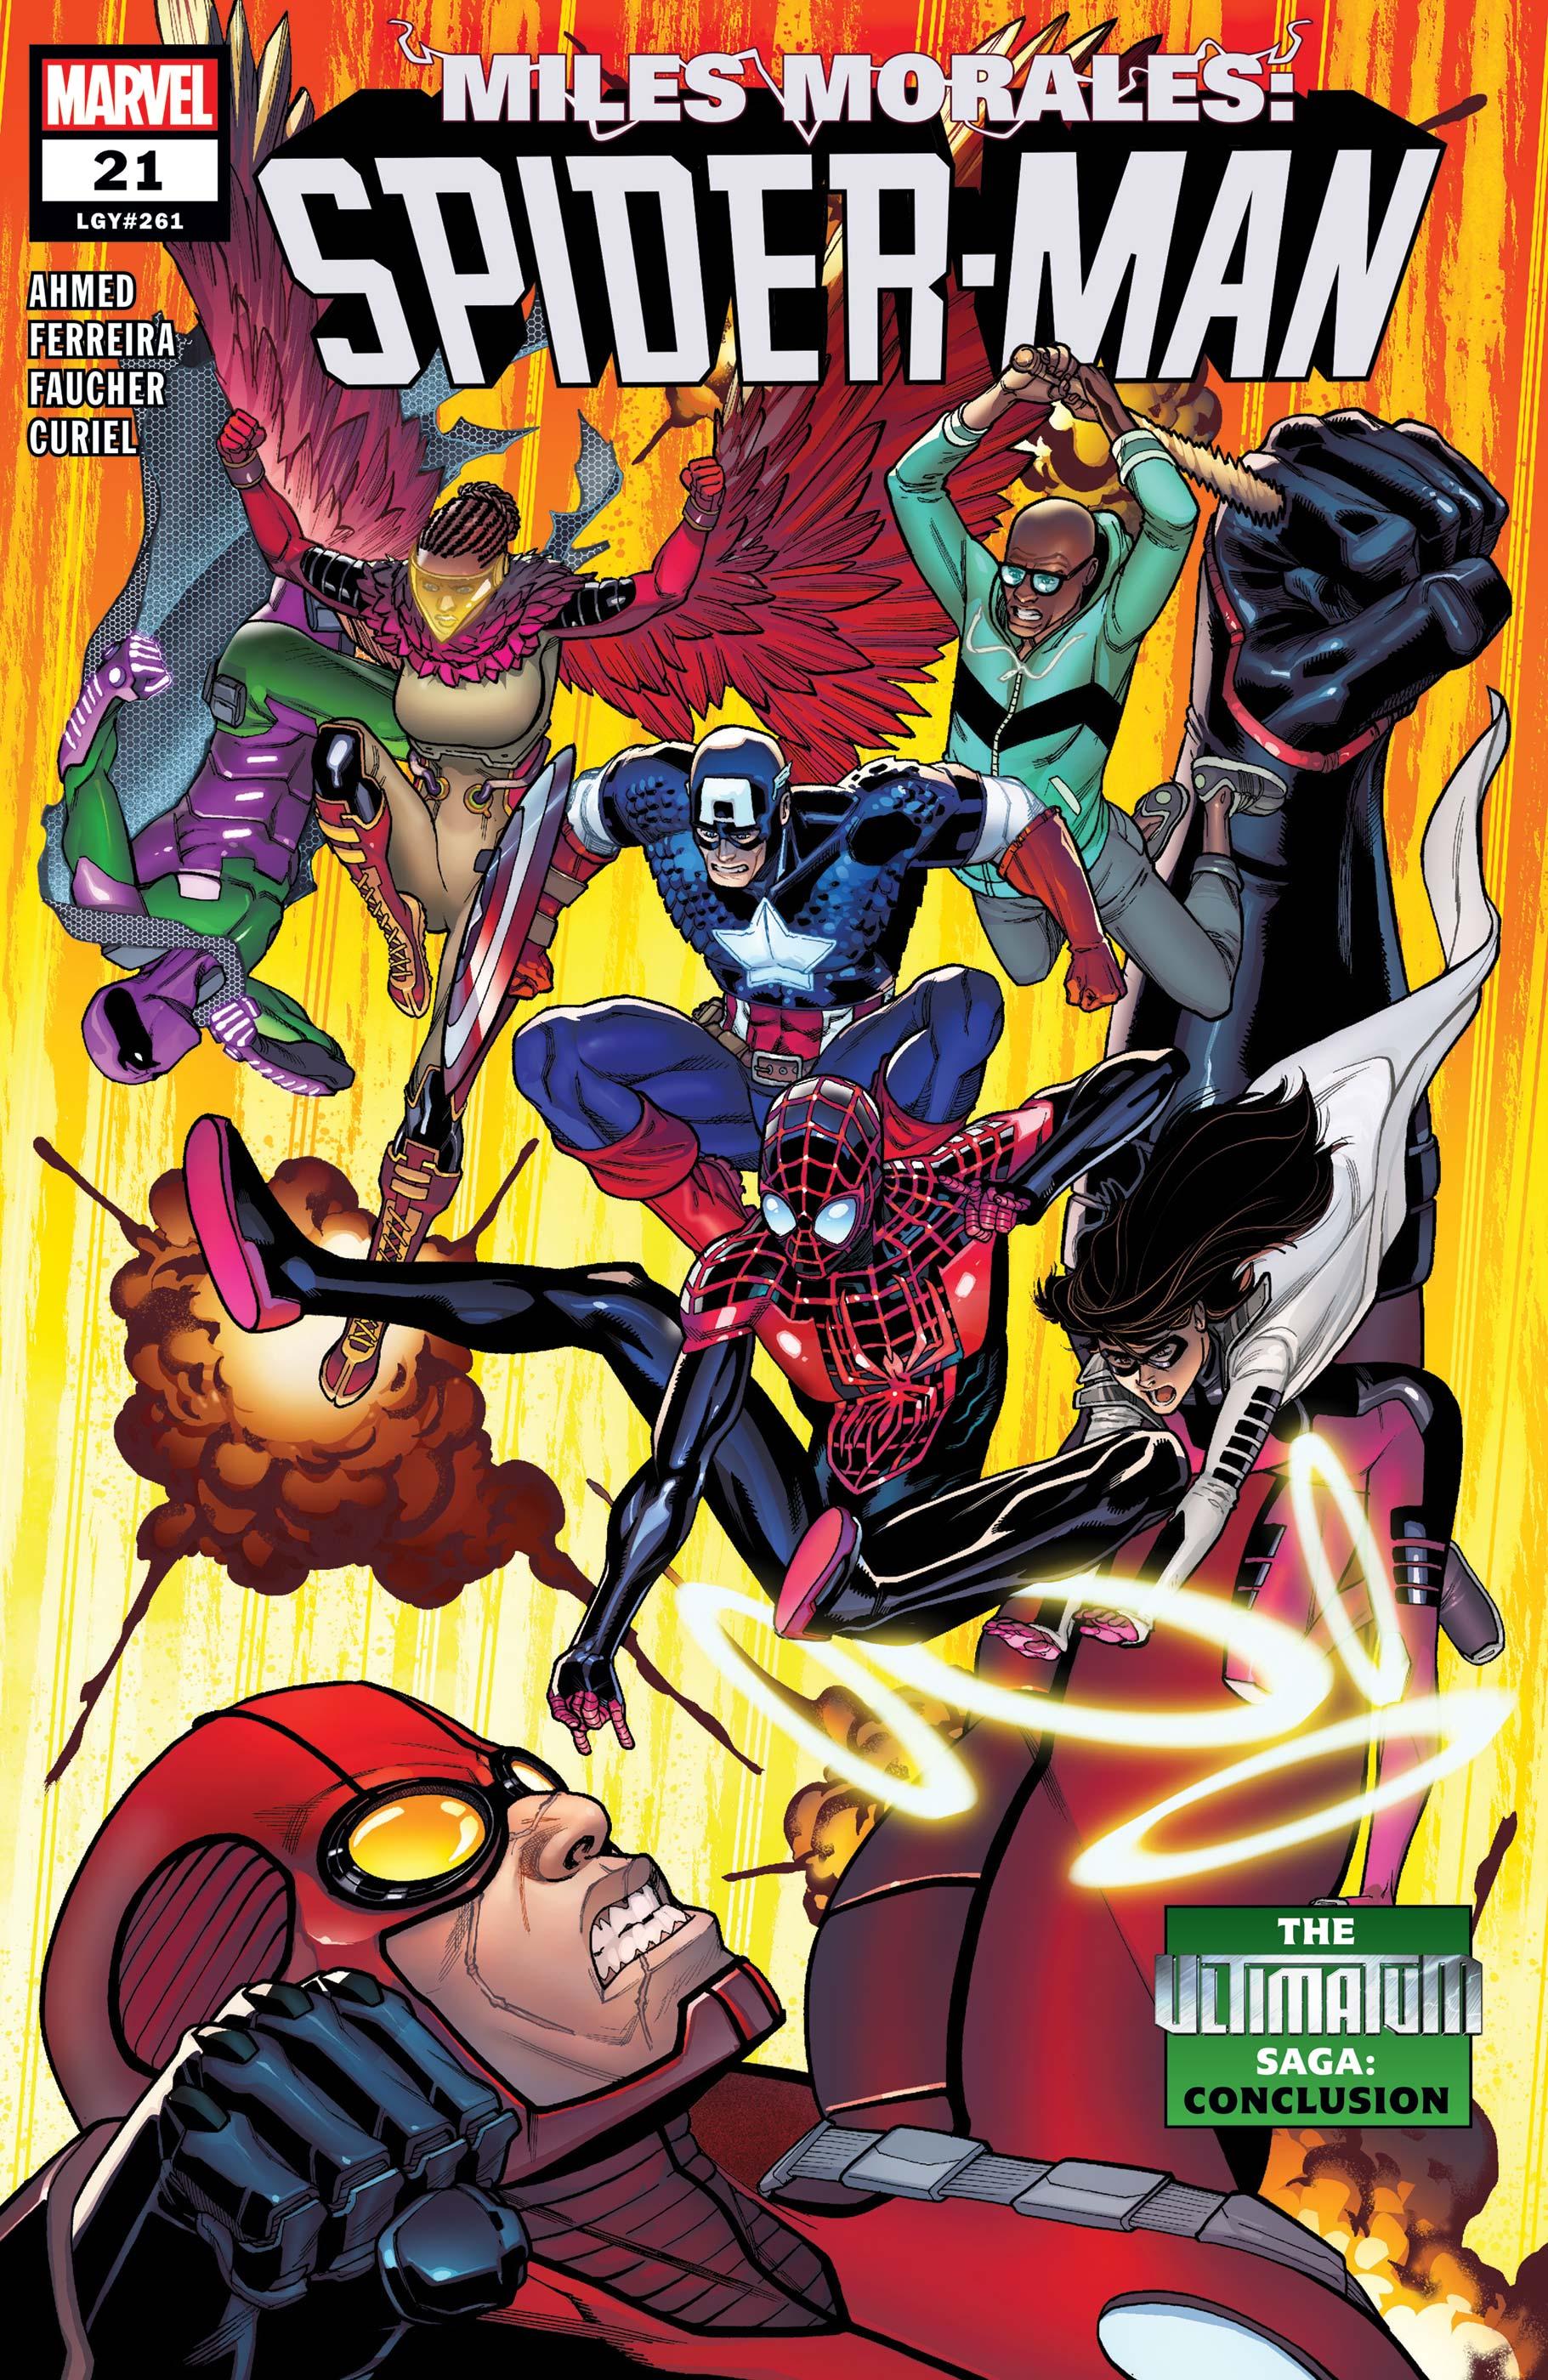 Miles Morales: Spider-Man (2018) #21